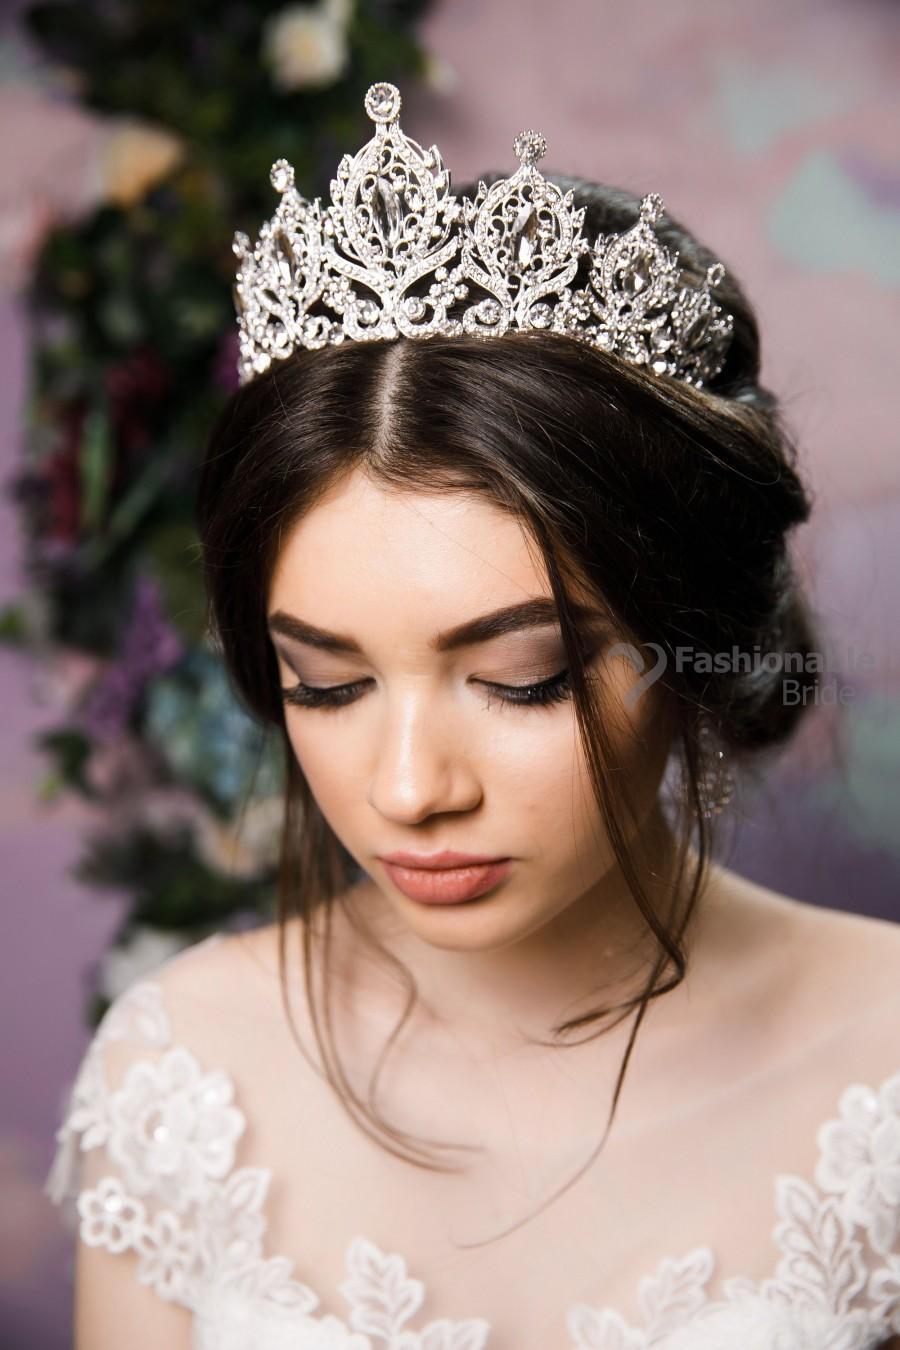 Hochzeit - Tiara,Bridal Tiara,Wedding Tiara,Gold Tiara,Wedding Tiara,Silver Tiara.